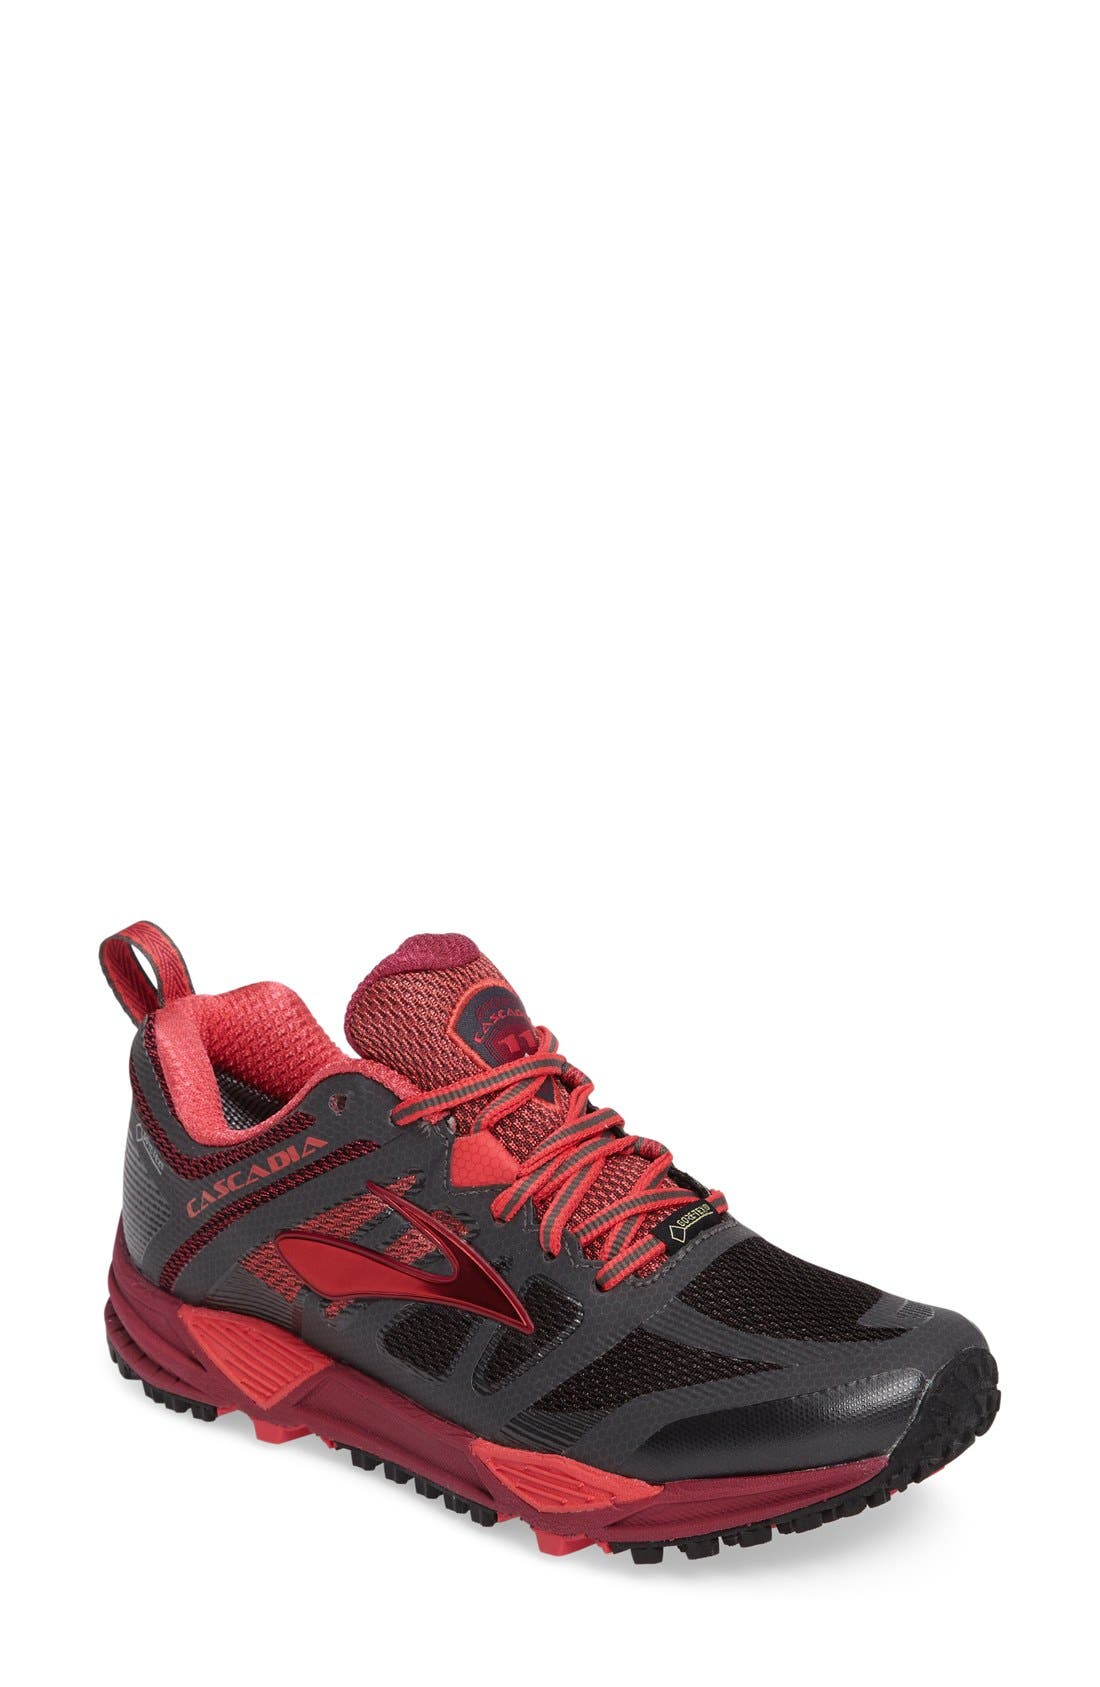 BROOKS Cascadia 11 GTX Trail Running Shoe, Main, color, 020